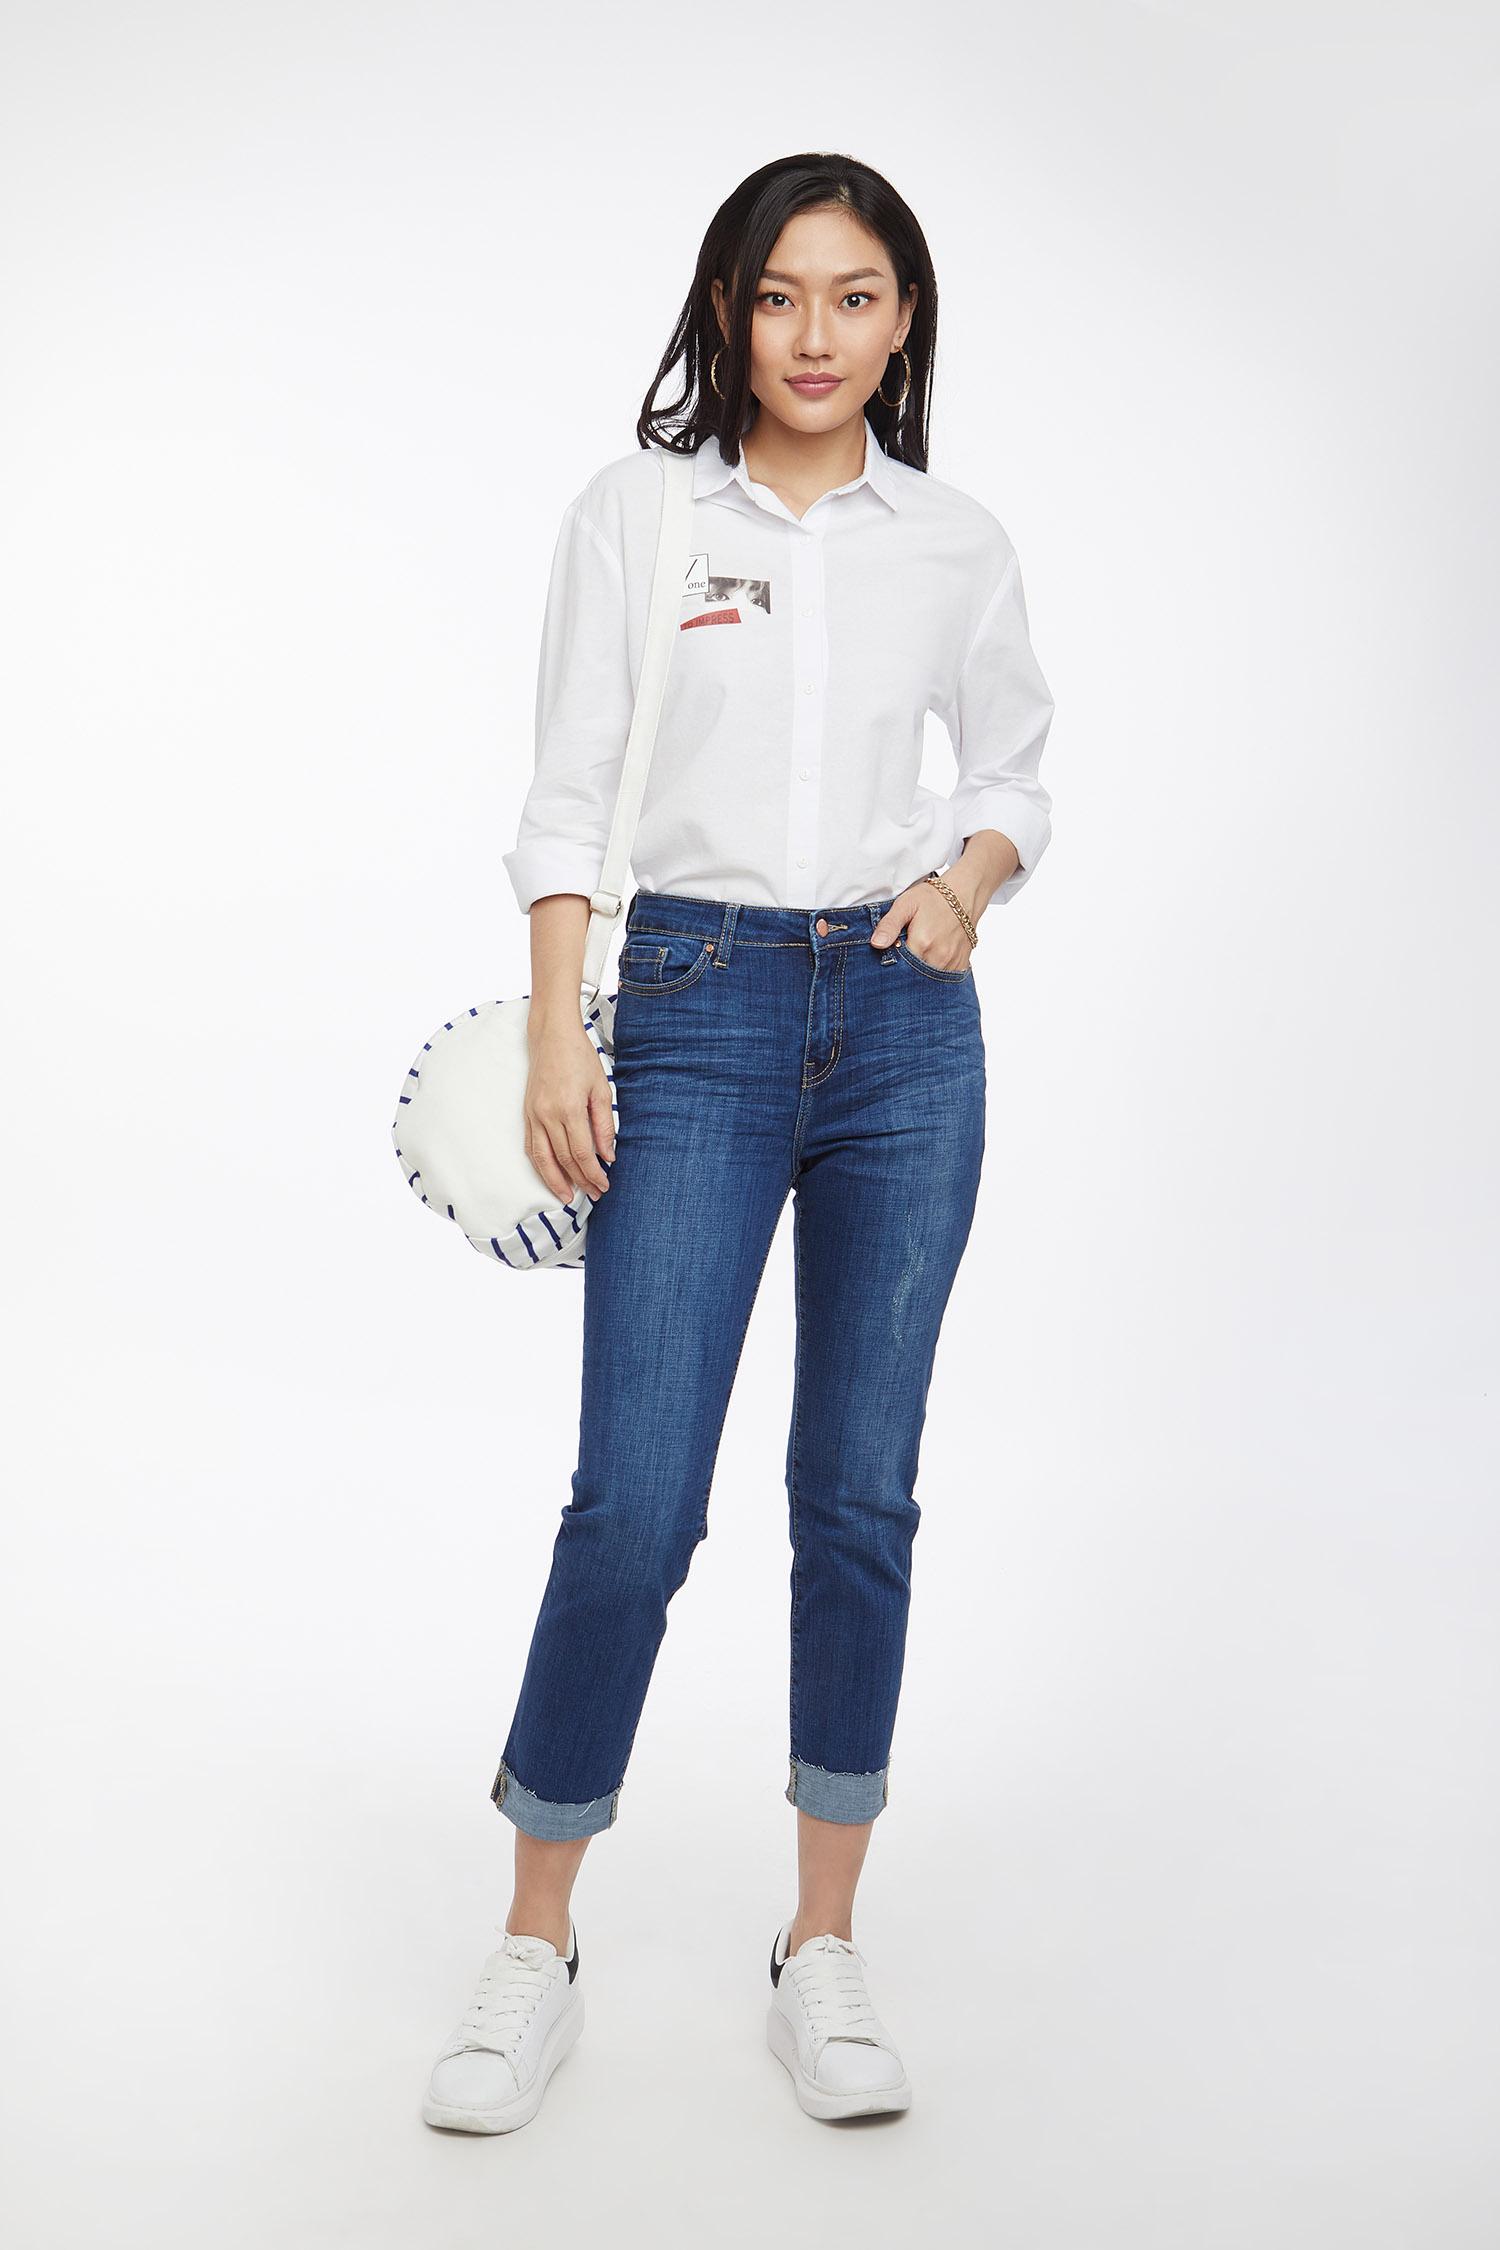 quần jean nữ - 1907003